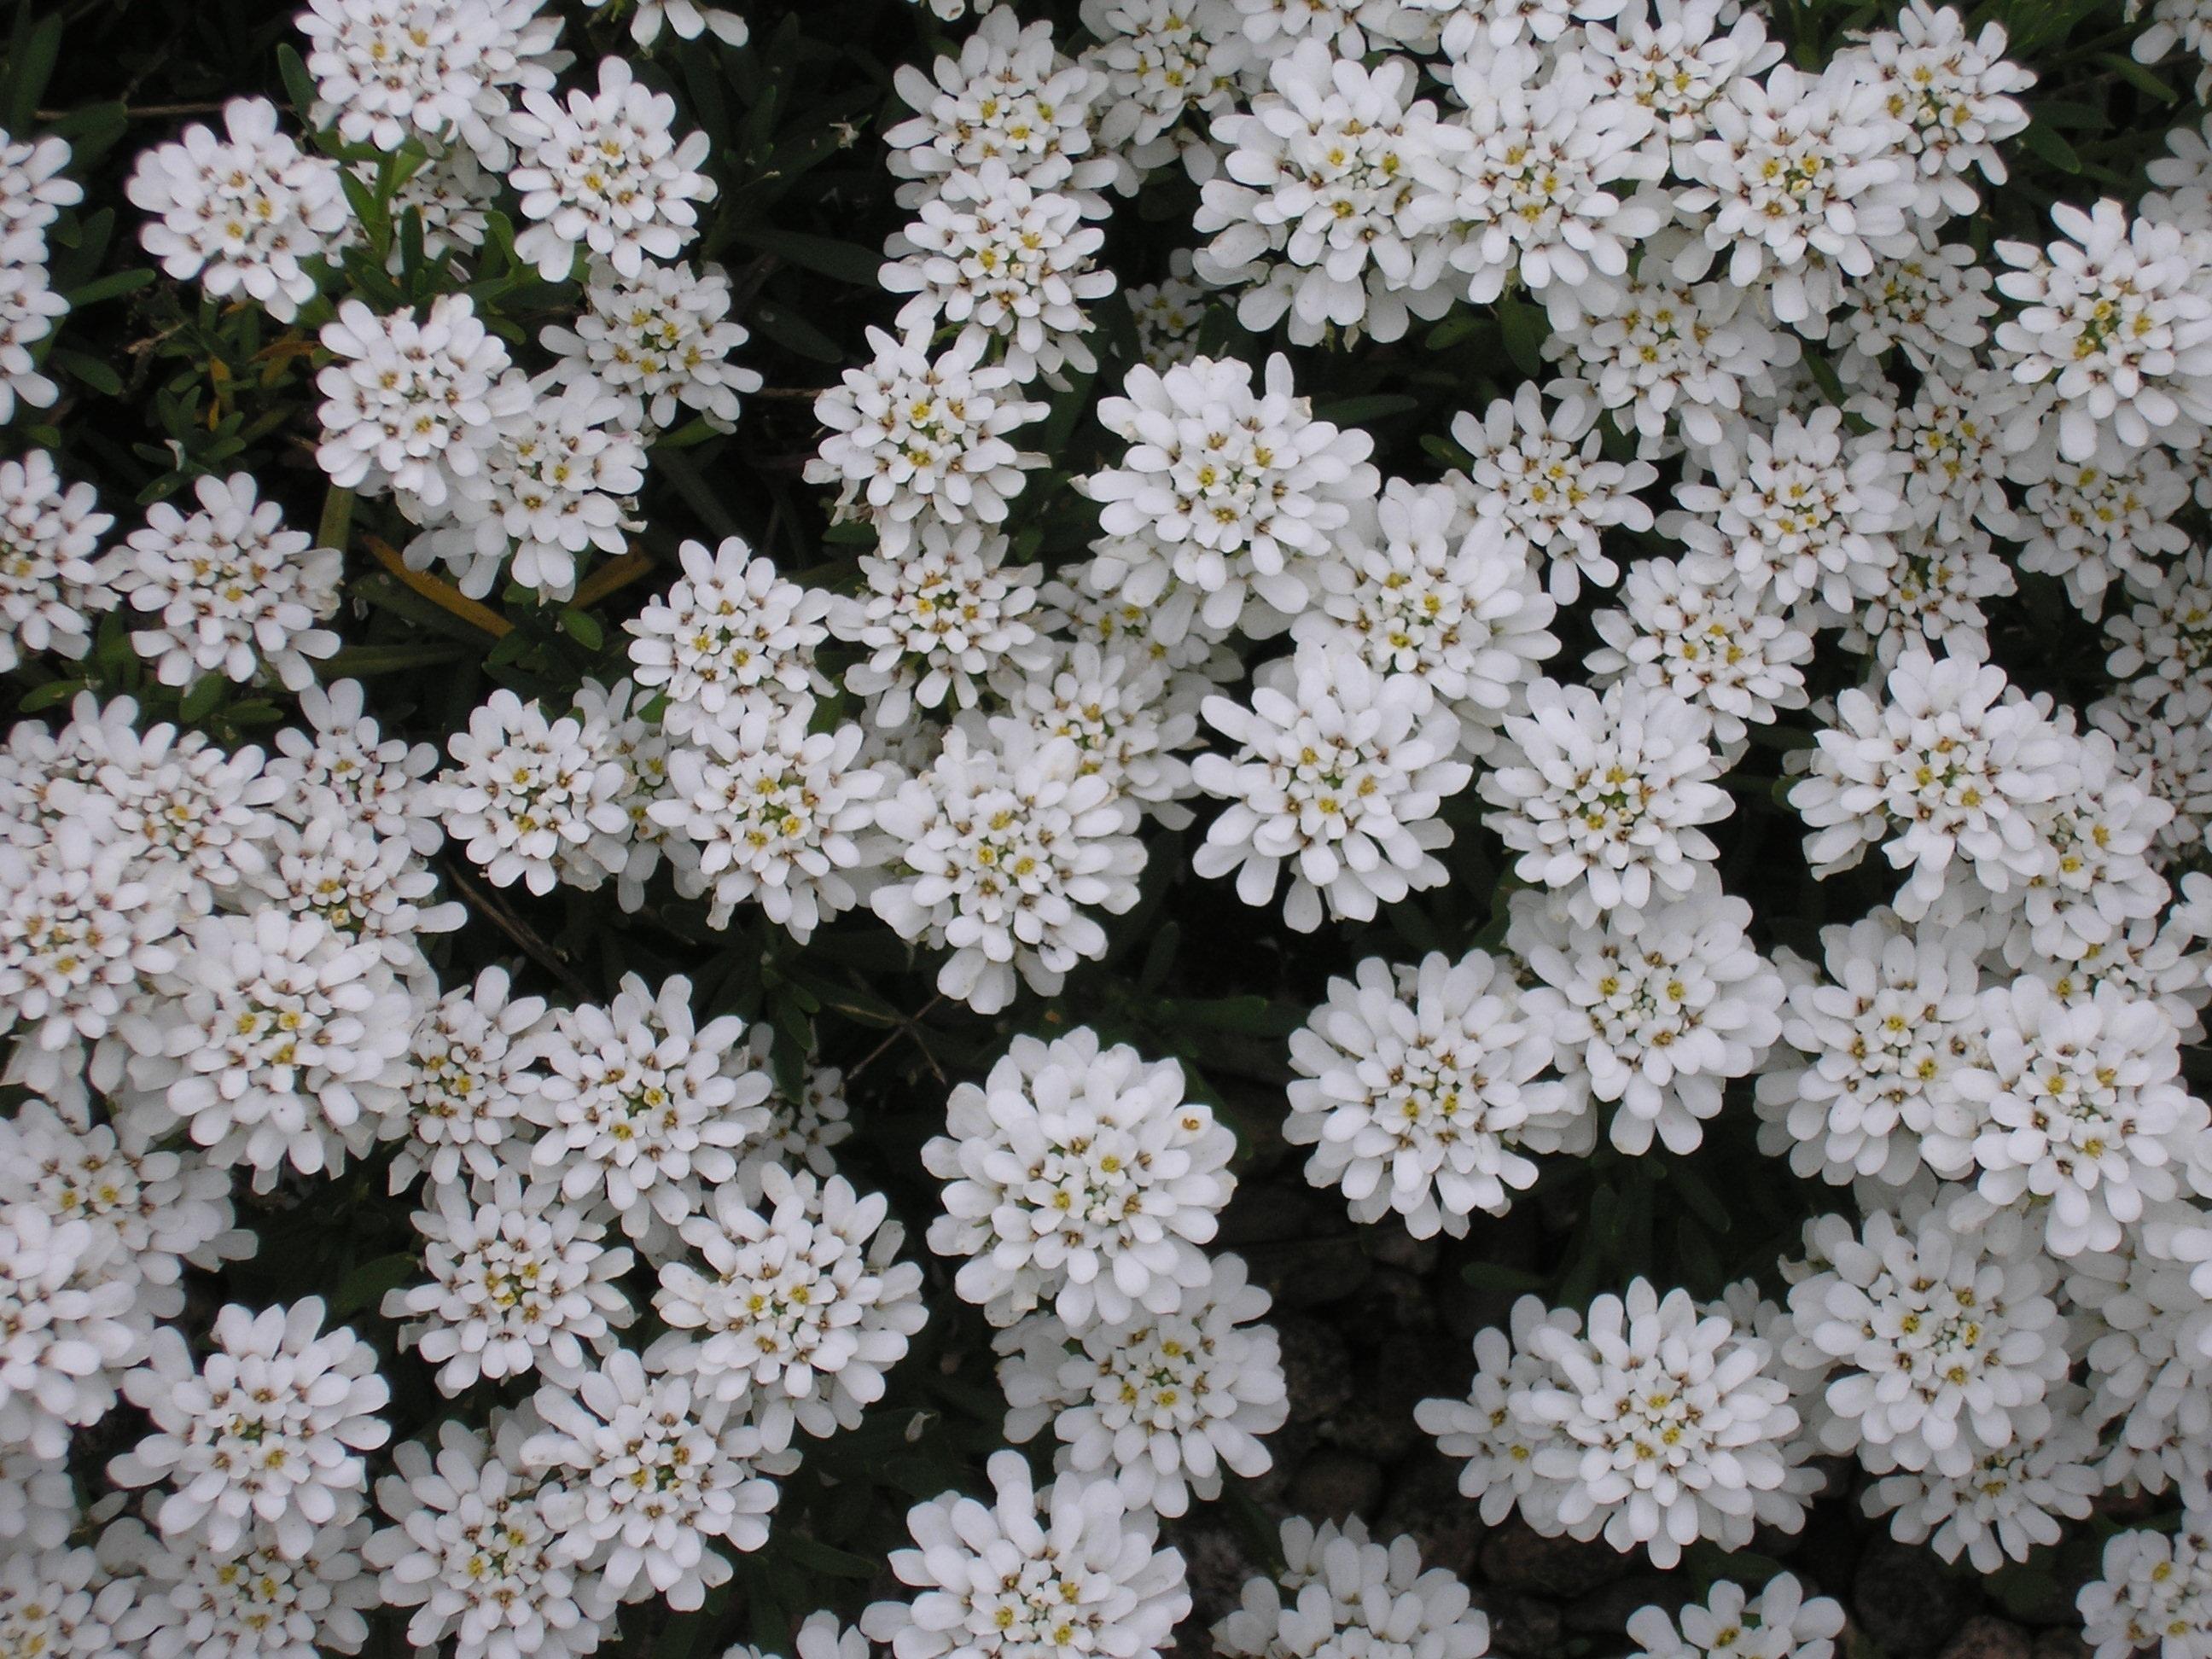 Free Images Nature Flower Garden Shrub Aster Yarrow White